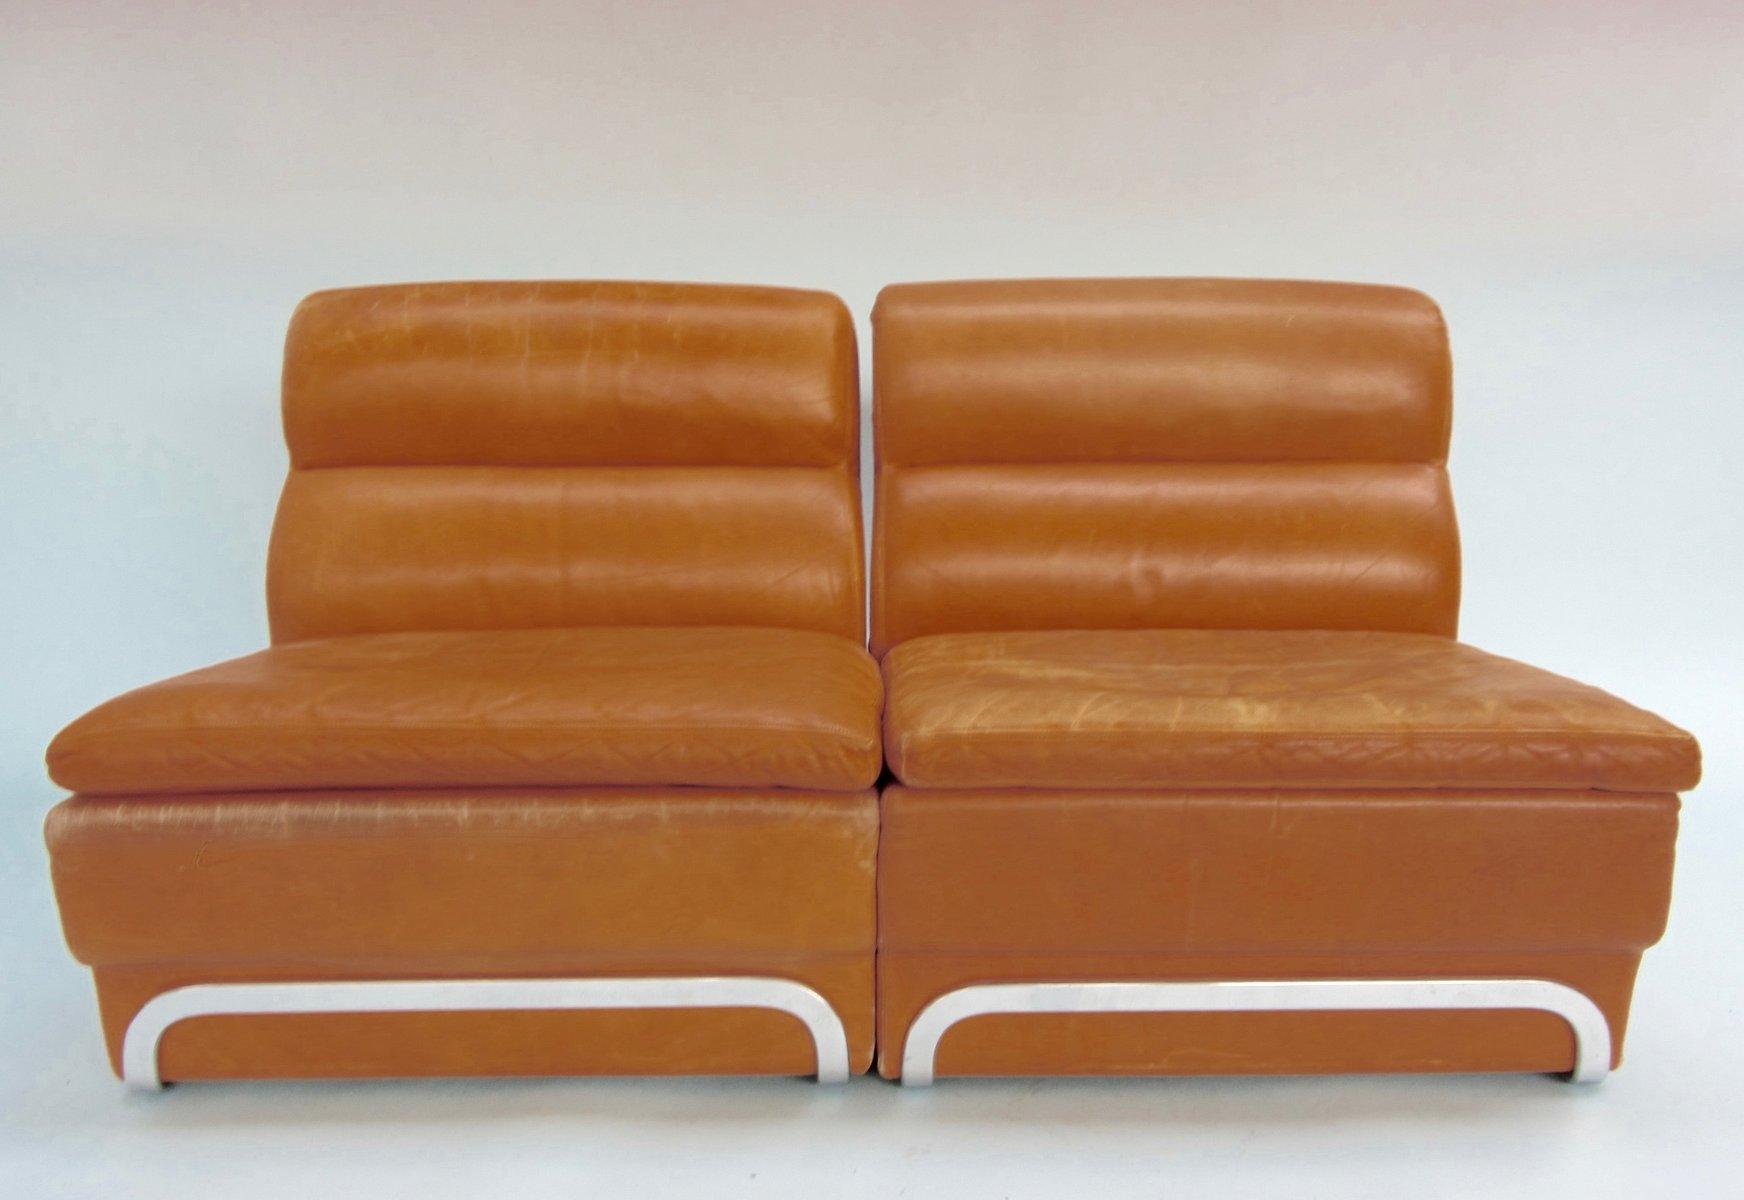 Vintage Sofa Items by Horst Brüning for Kill International Set of